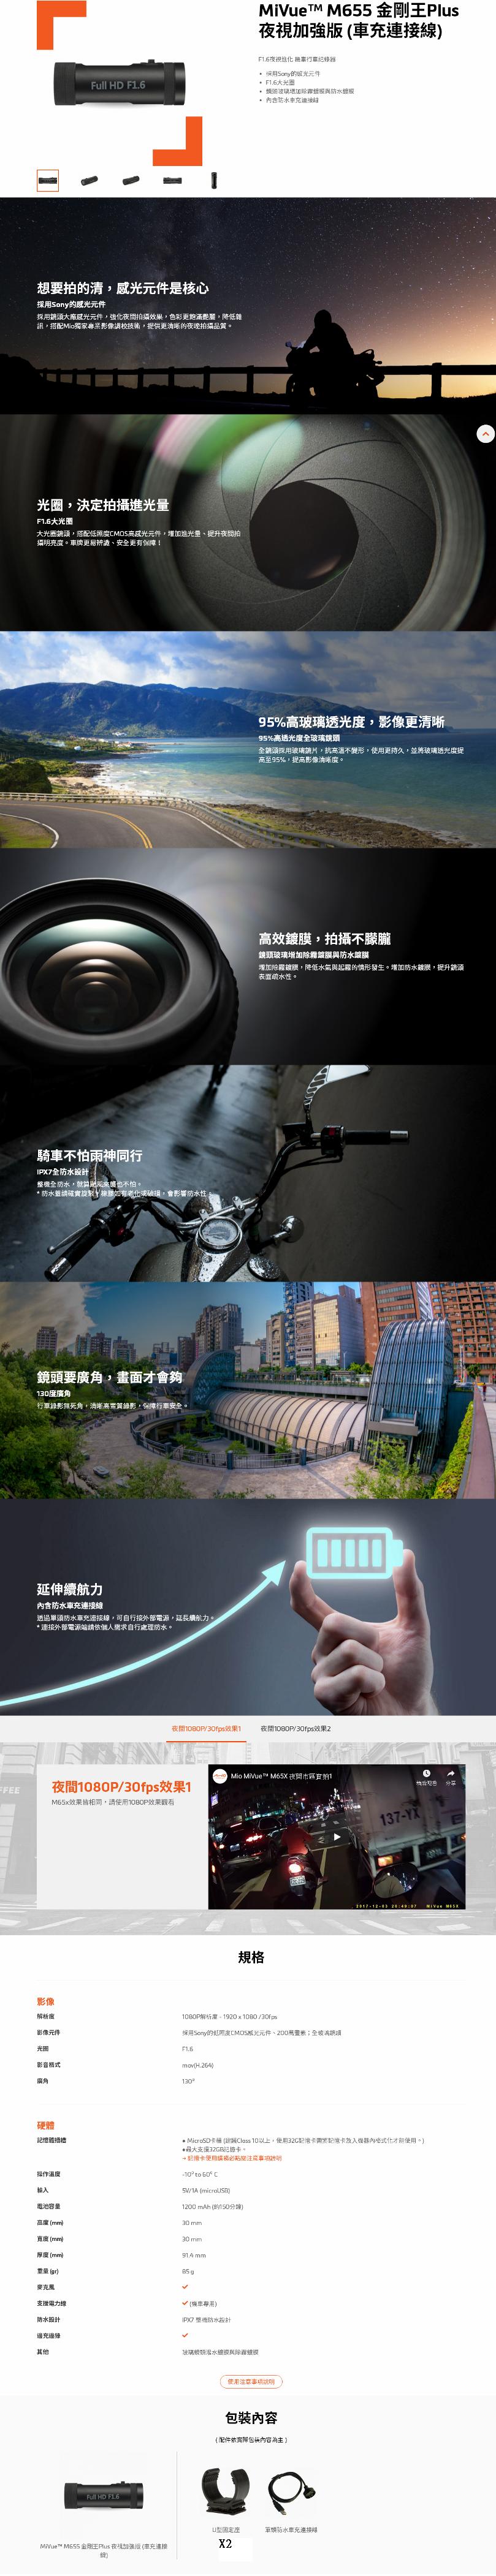 MiVue™ M655 金剛王Plus_夜視加強版 車充連接線 - M系列 - 機車行車記錄器 - Mio